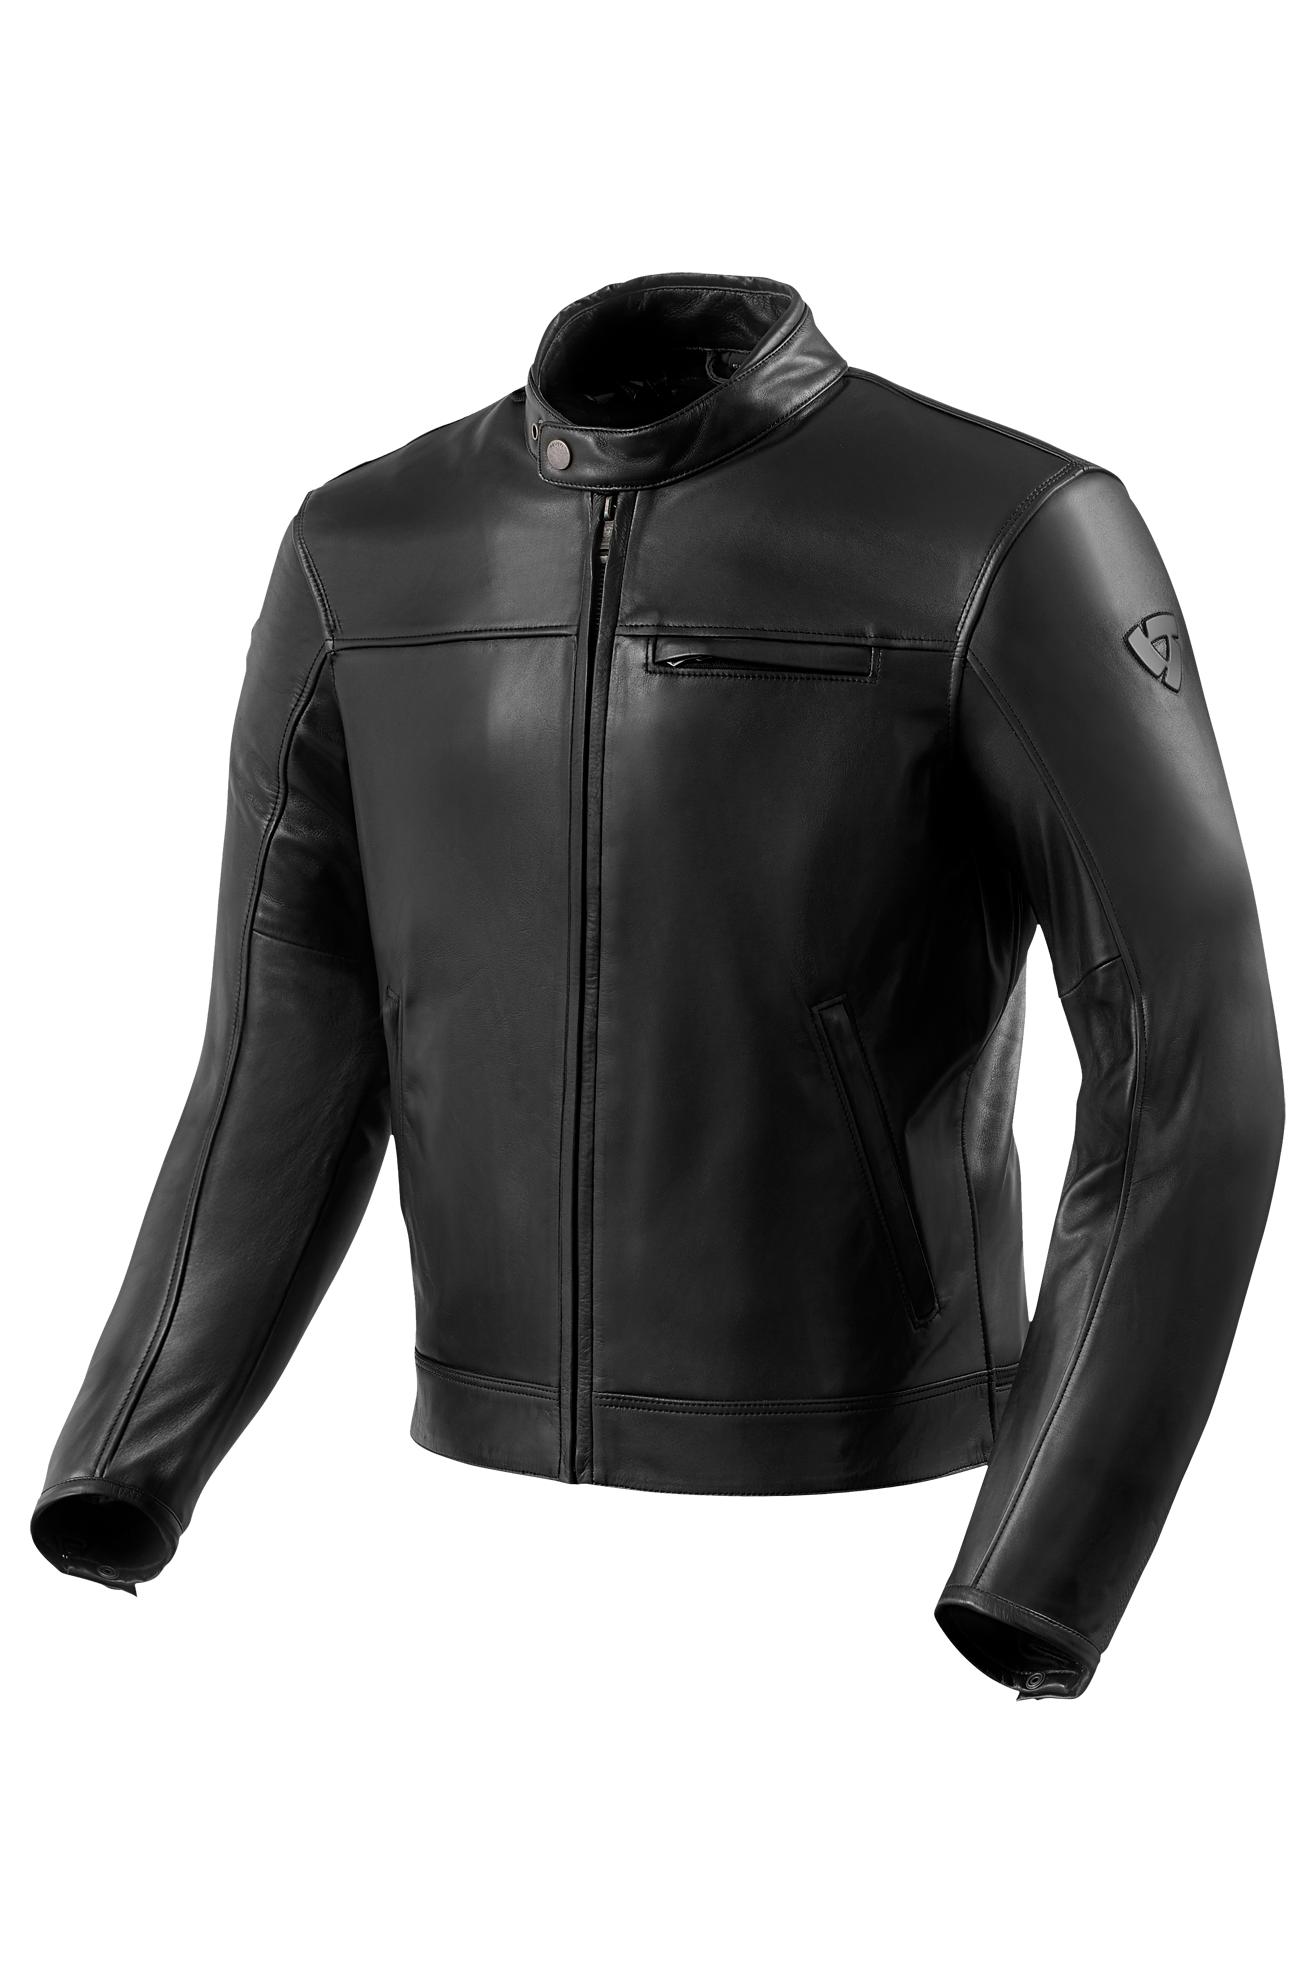 rev'it! giacca moto  roamer 2 nera